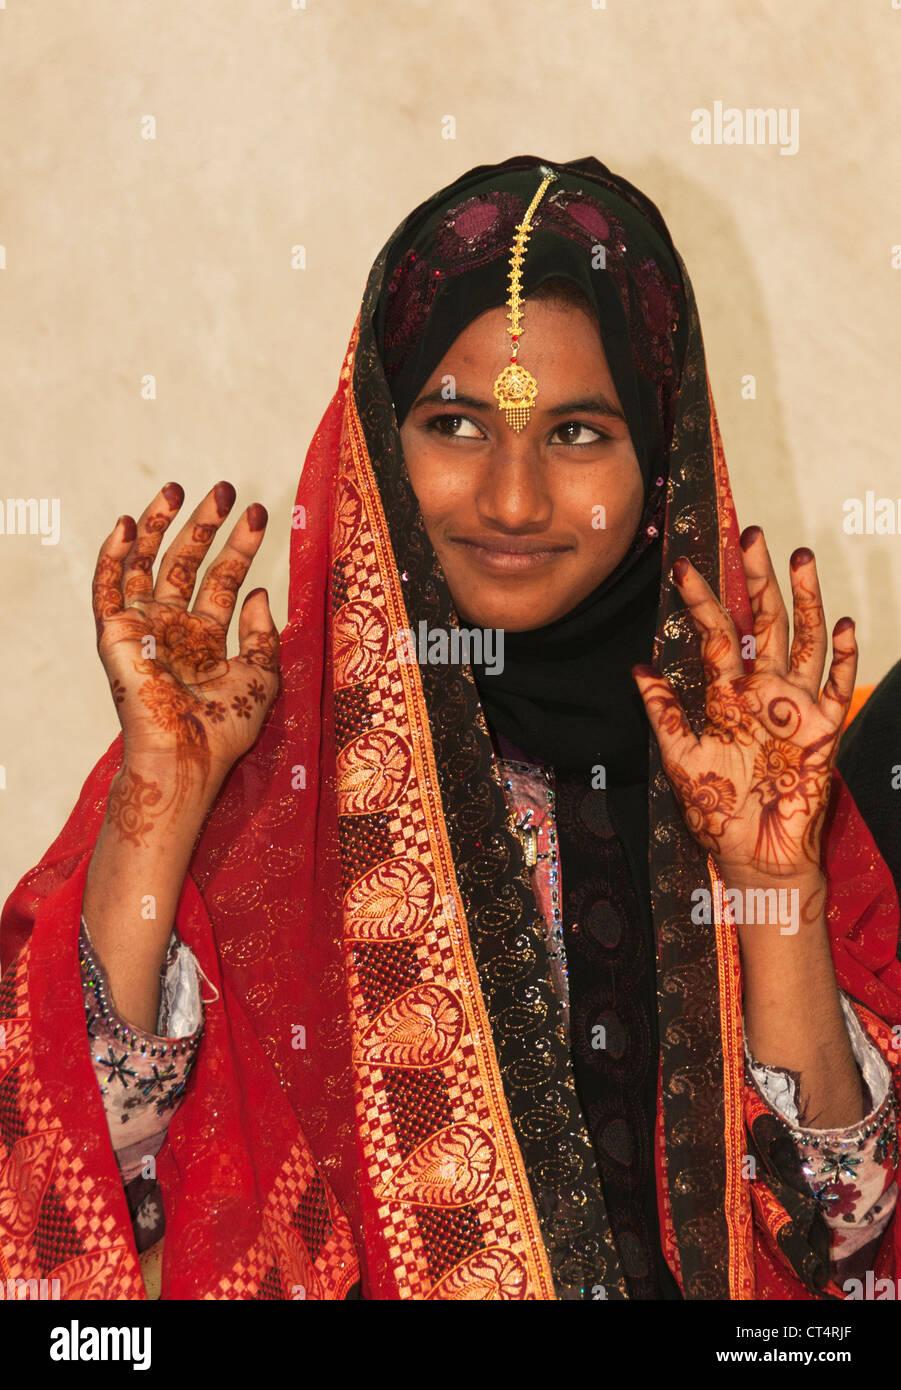 Oman girls